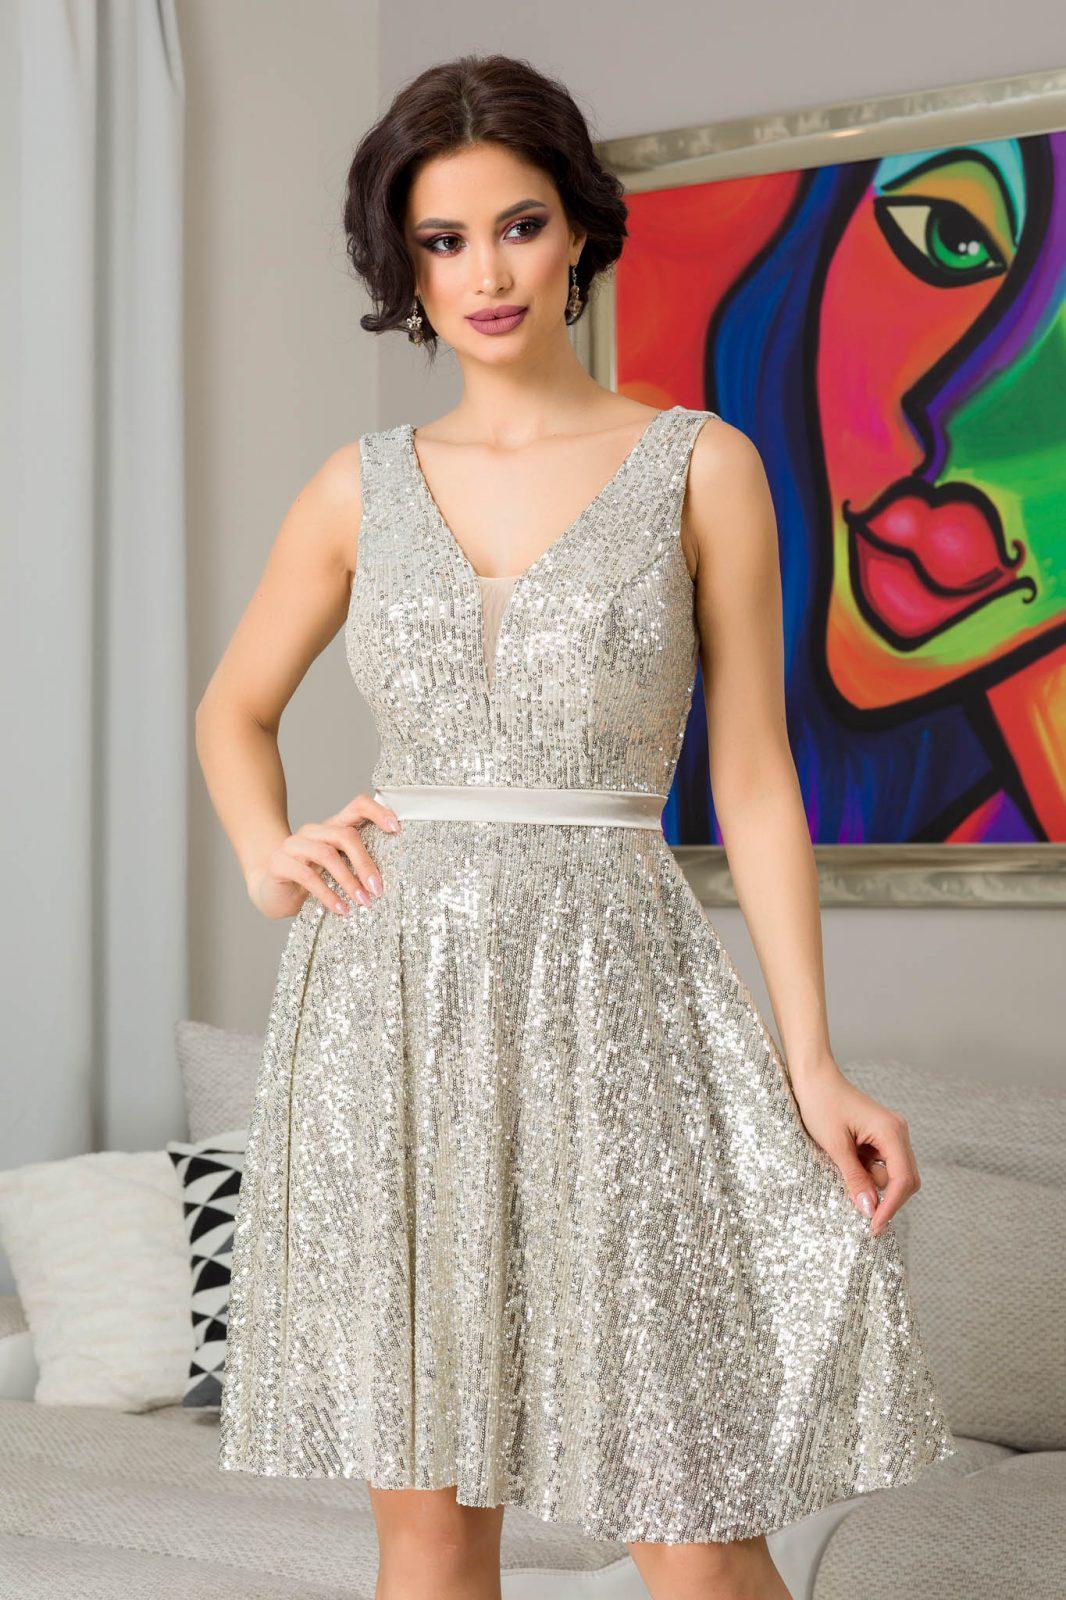 Bianca Nude Βραδινό Φόρεμα 7311 2